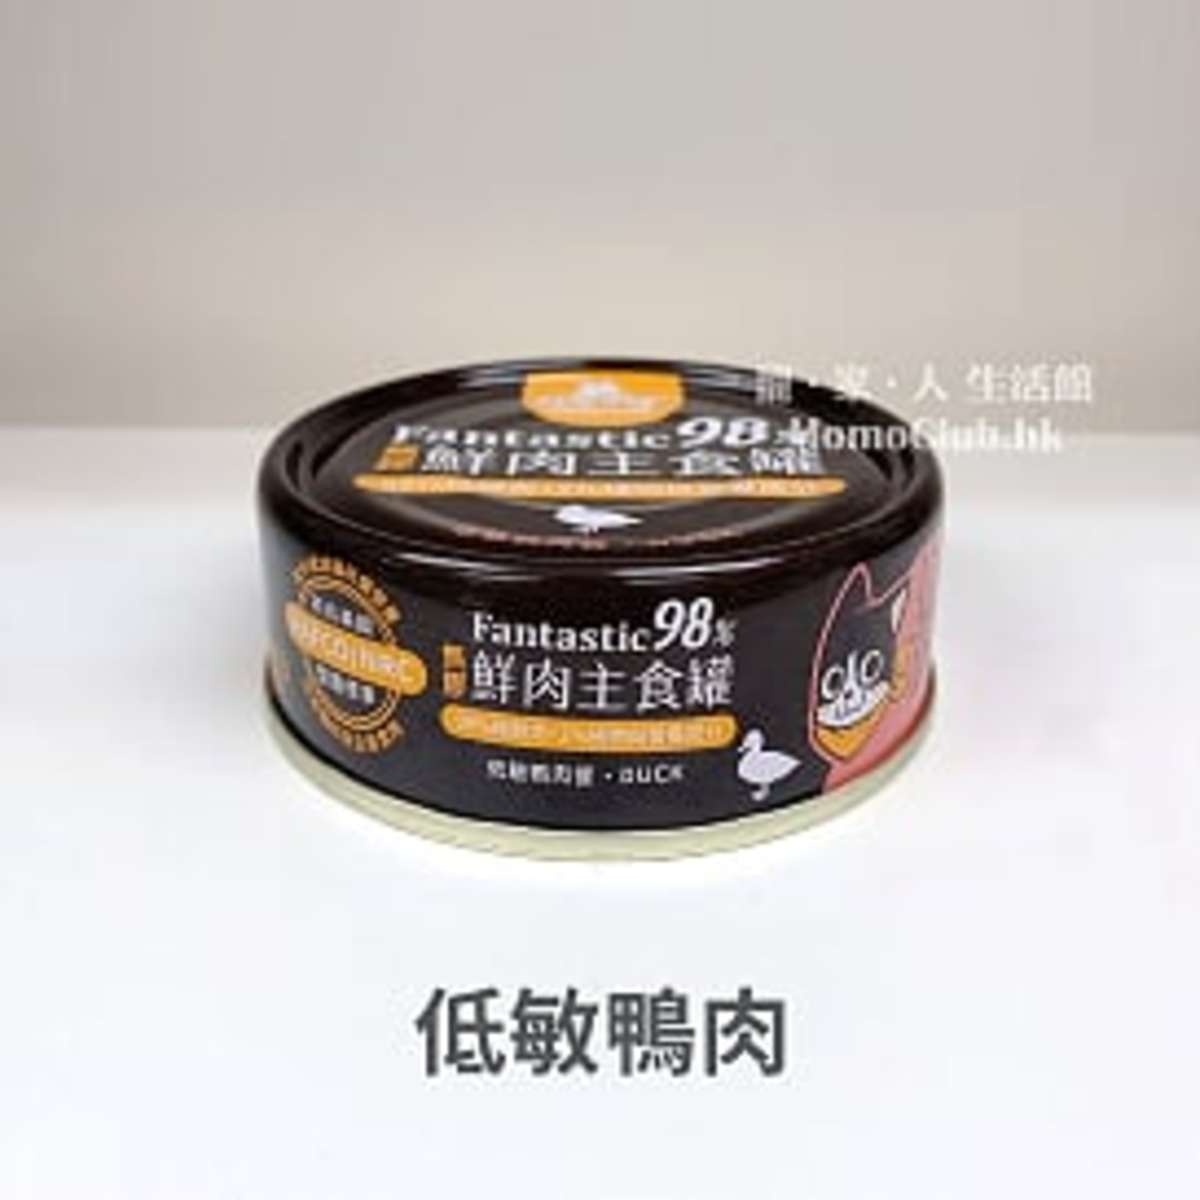 98% Fantastic Wet Food (Duck) 3罐, 80g x 3 (084025_3)